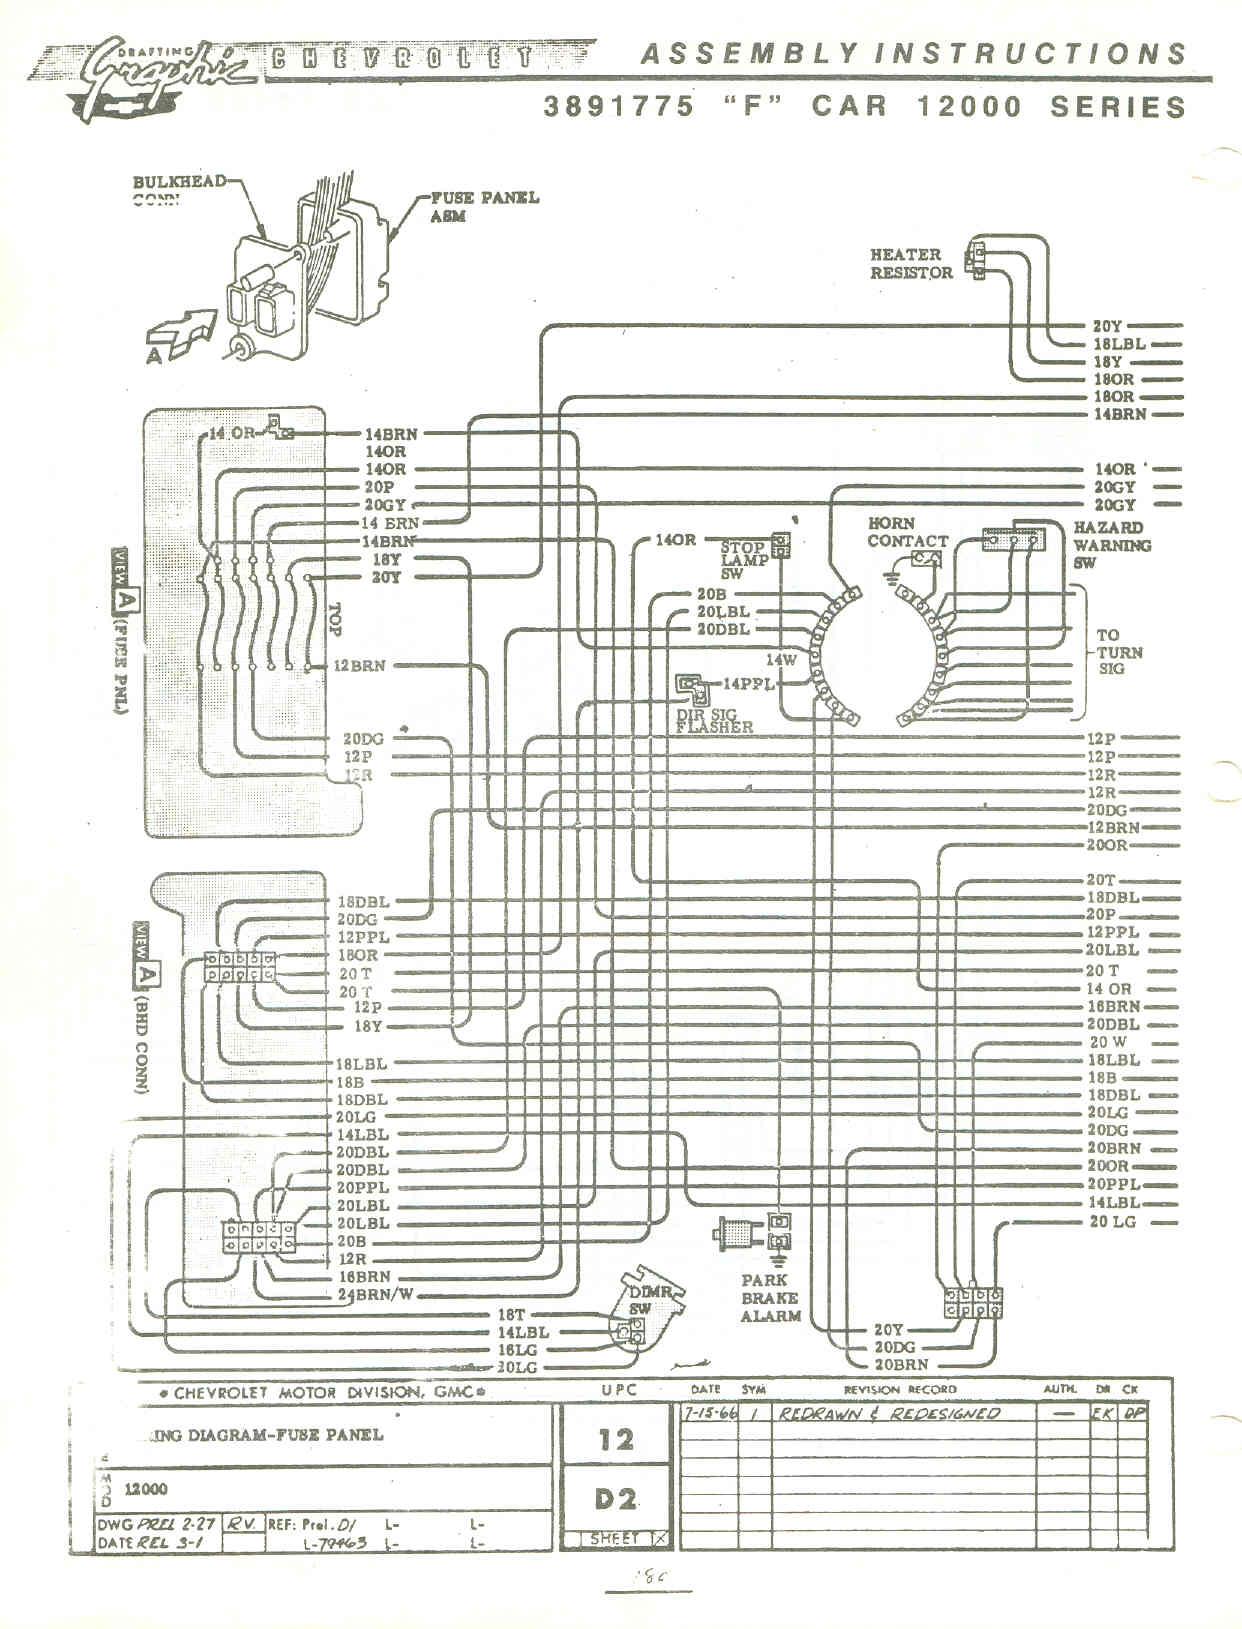 67 Camaro Coil Wiring Diagram Wiring Diagrams Electro Electro Chatteriedelavalleedufelin Fr